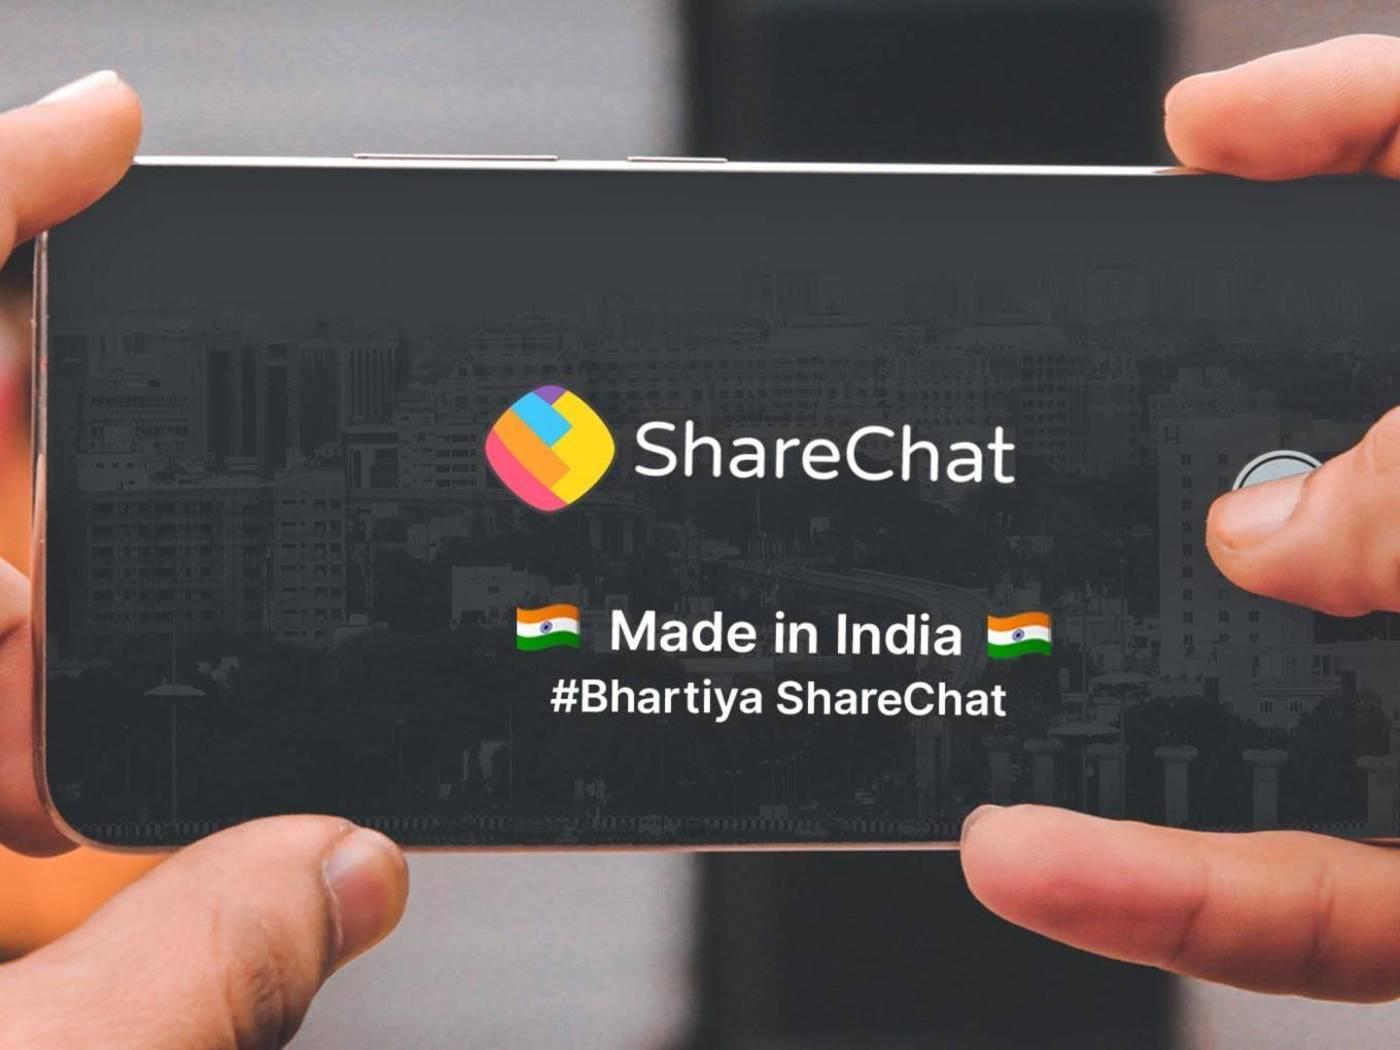 印度本土社交应用Sharechat/Inventiva